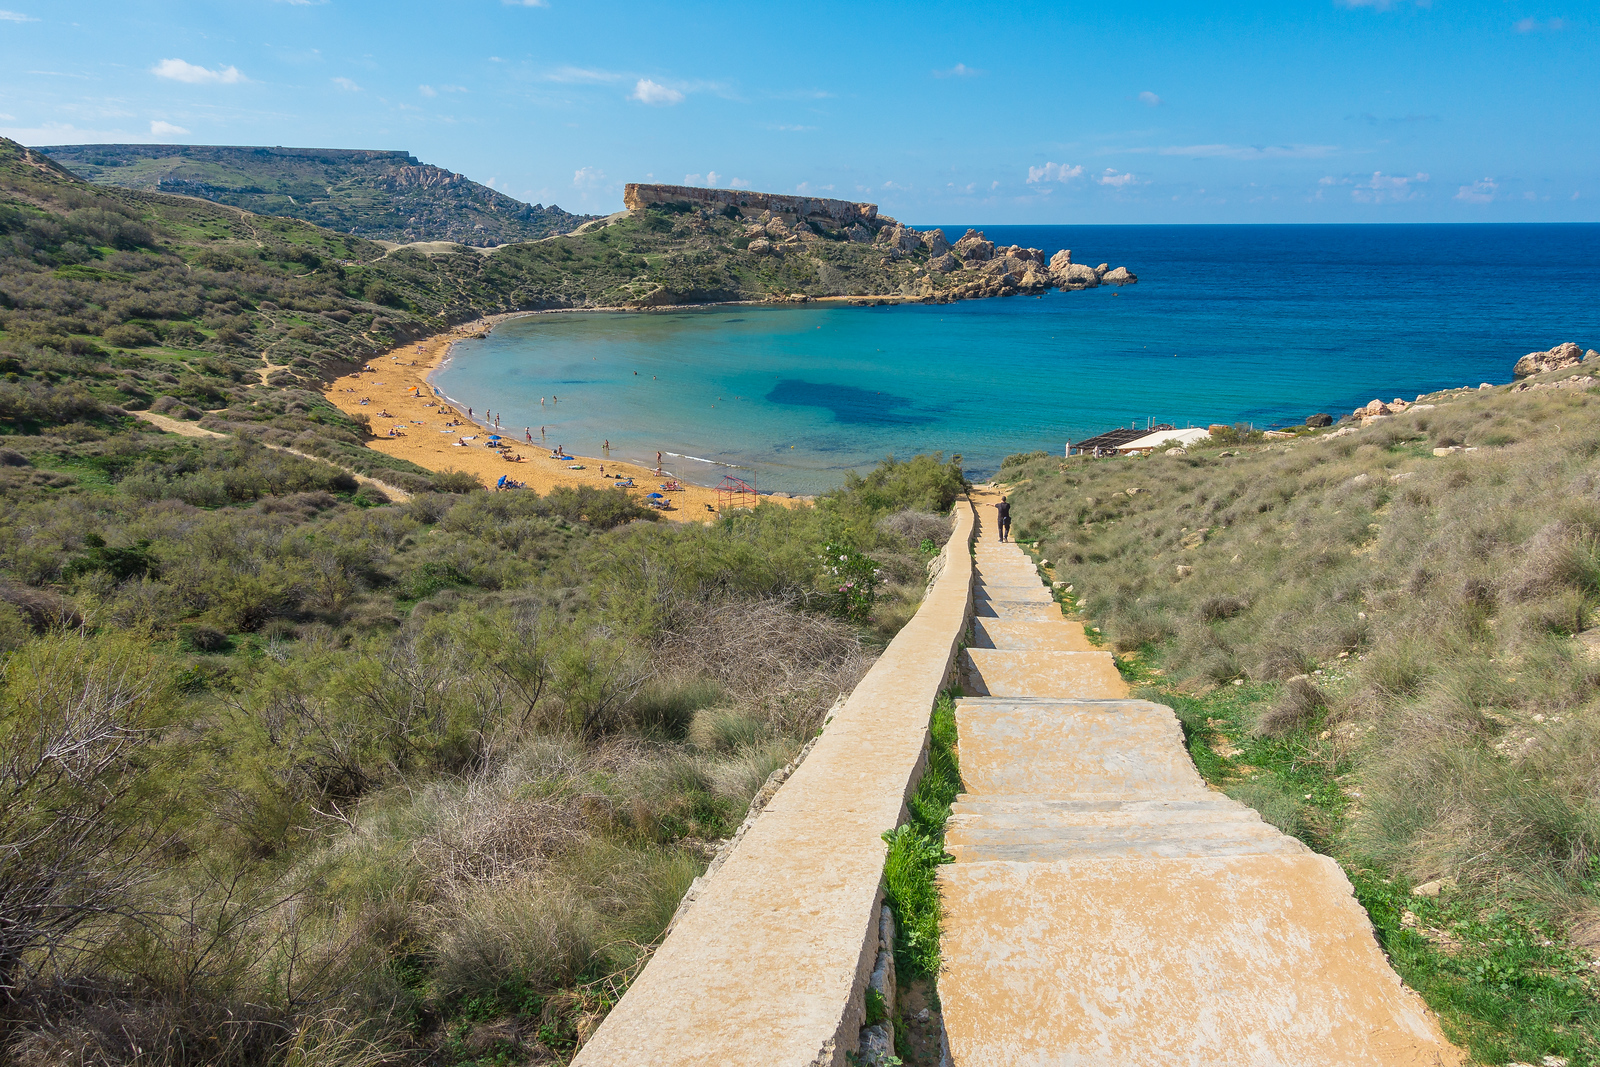 Malta Pictures - Ghan Tuffieha Bay